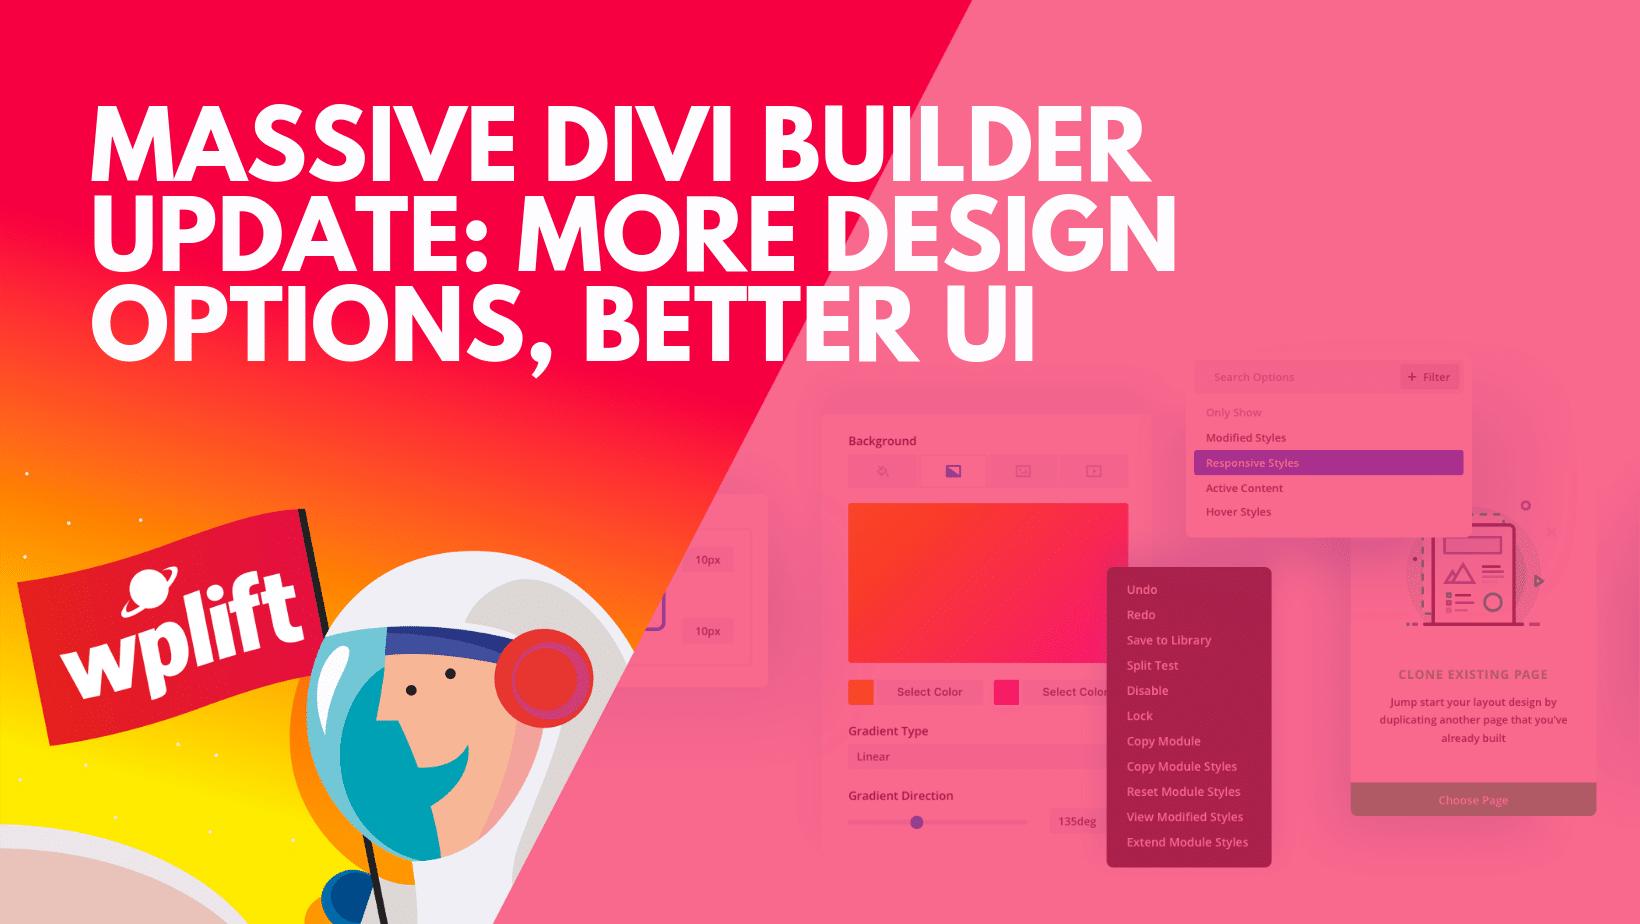 More Design Options, Better UI